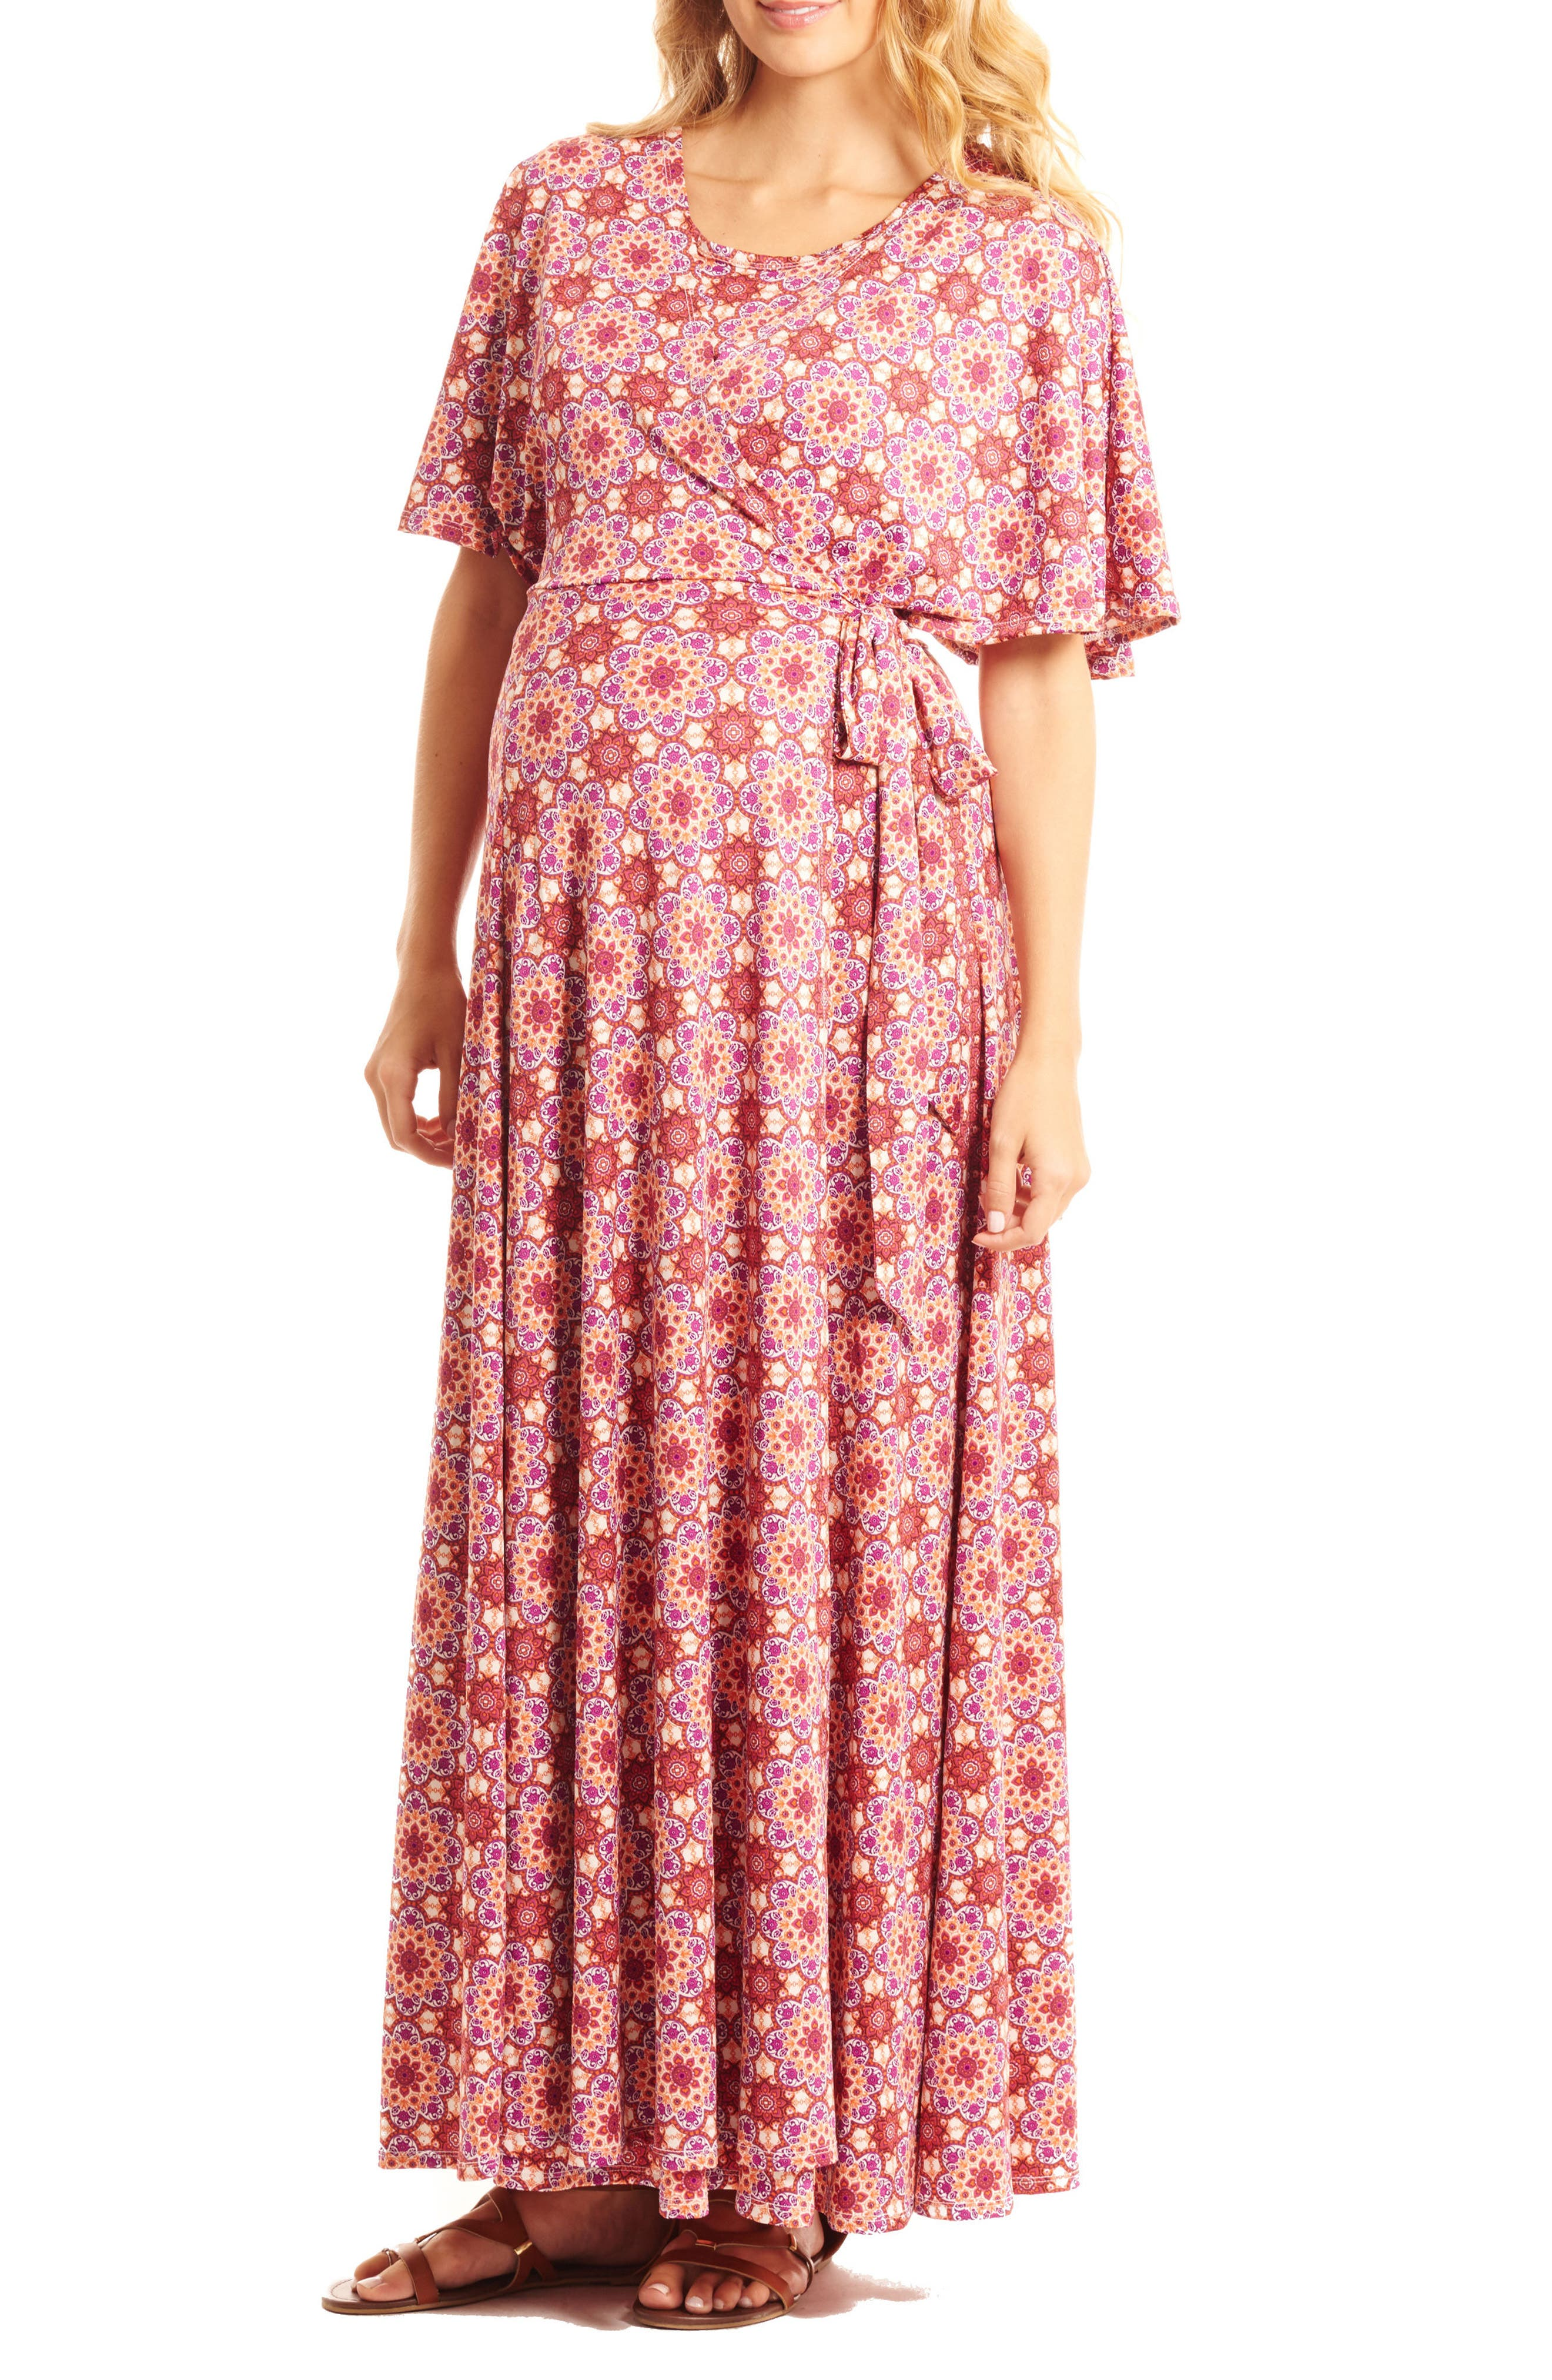 Asa Maternity/Nursing Maxi Wrap Dress,                             Alternate thumbnail 4, color,                             Sangria